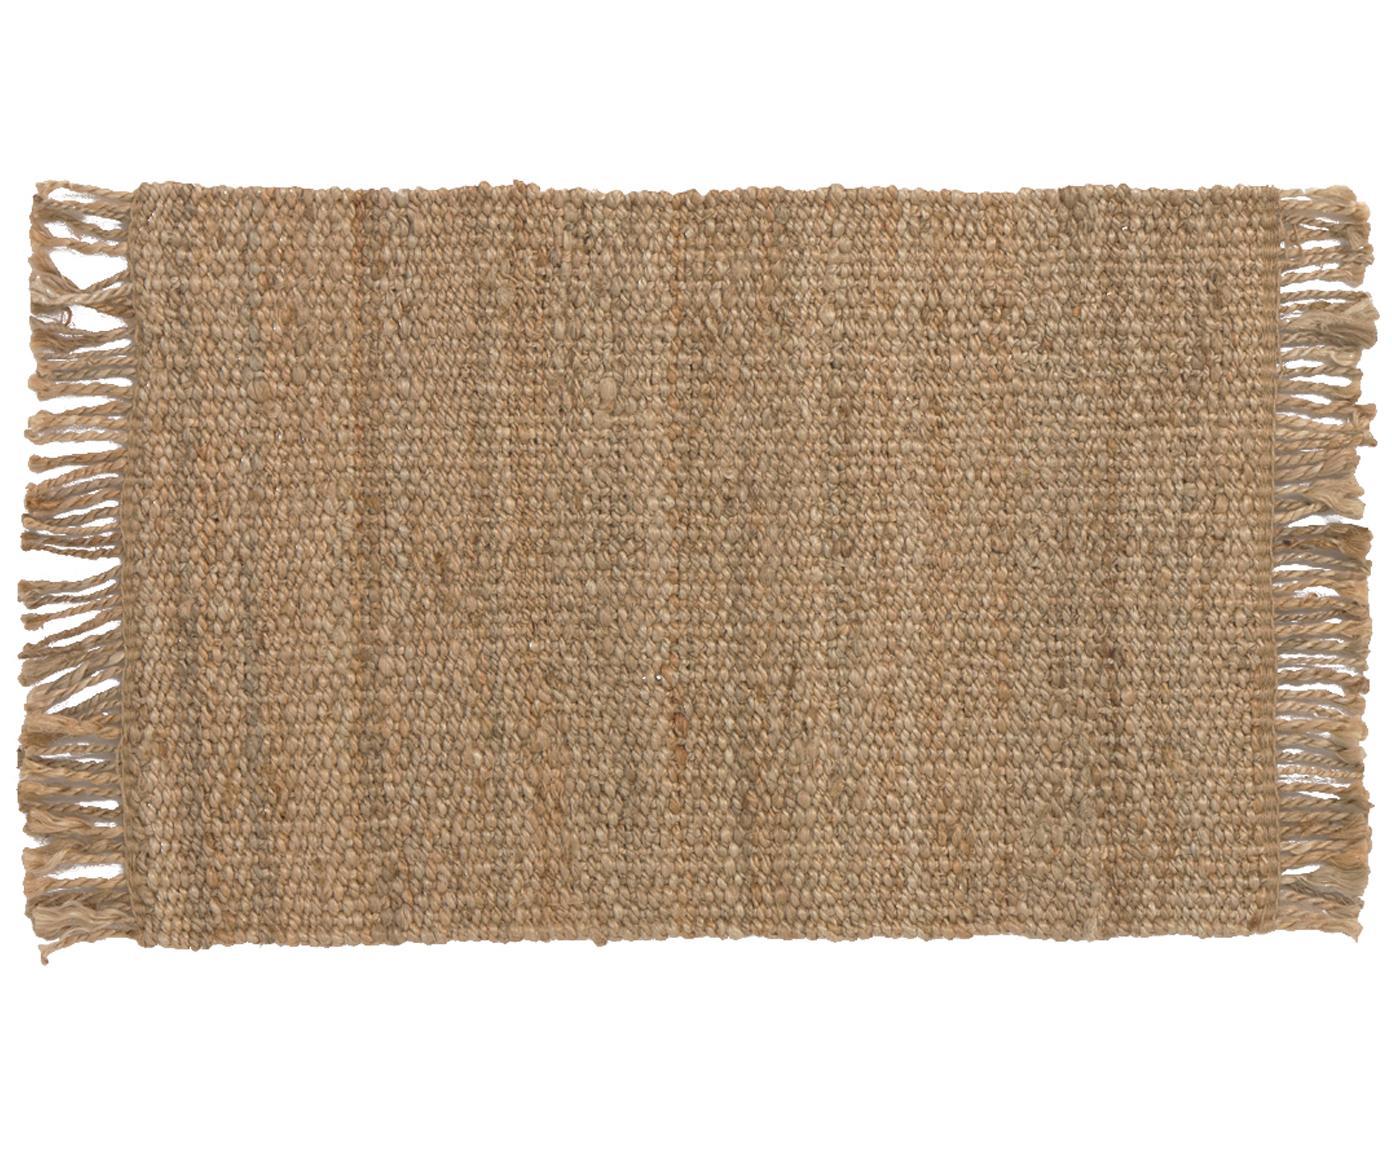 Handgefertigter Jute-Teppich Cadiz mit Fransen, Jute, Jute, B 150 x L 200 cm (Größe S)